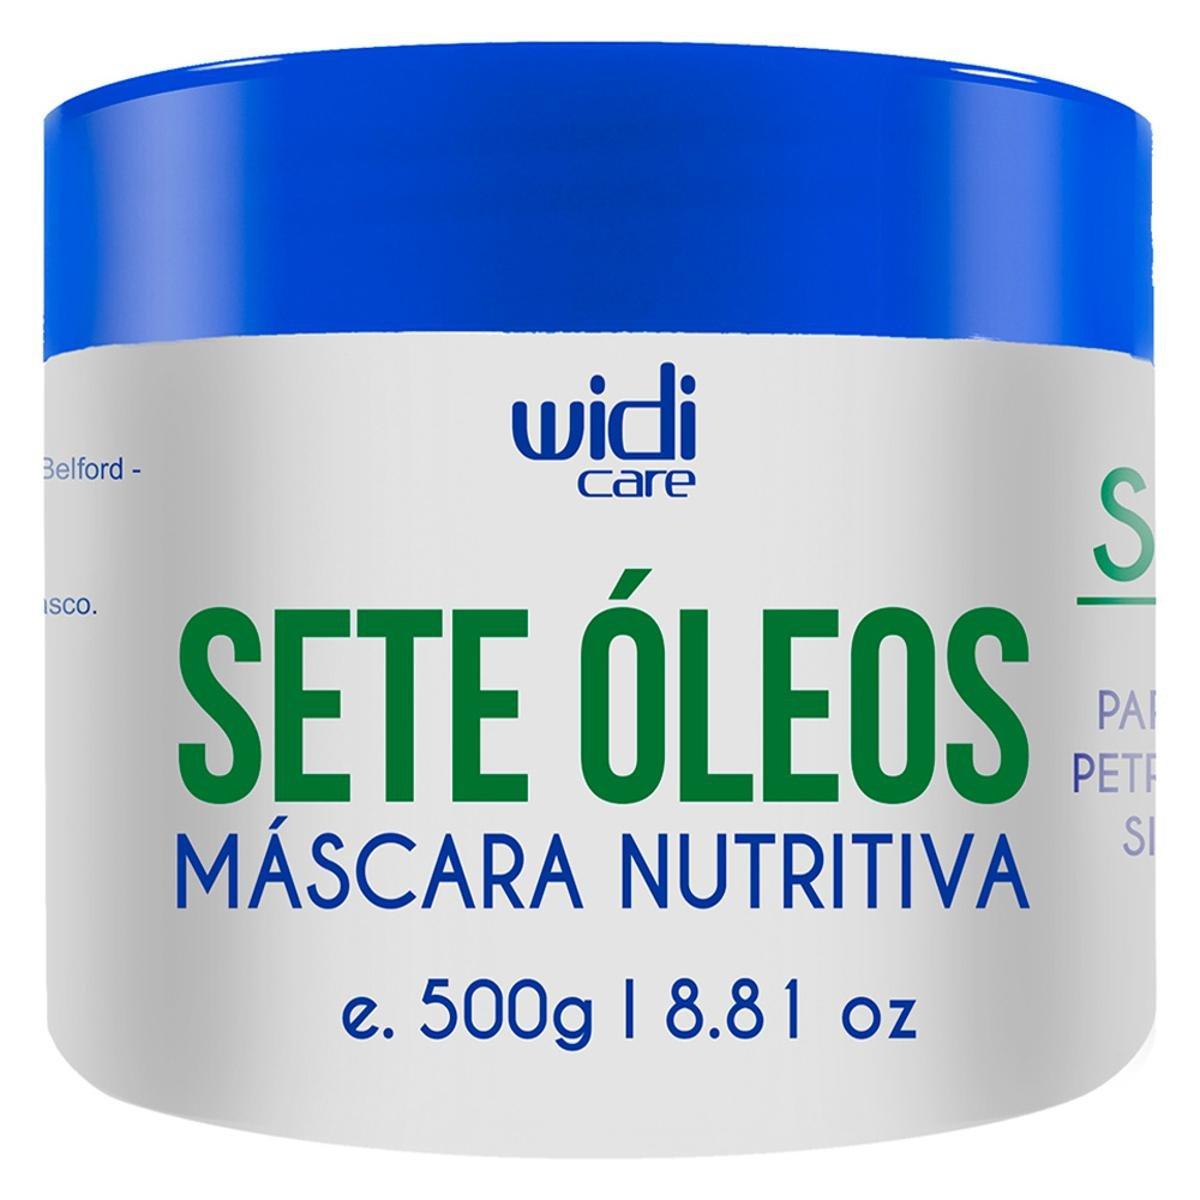 Widi Care Máscara Nutritiva Sete Óleos - 500g